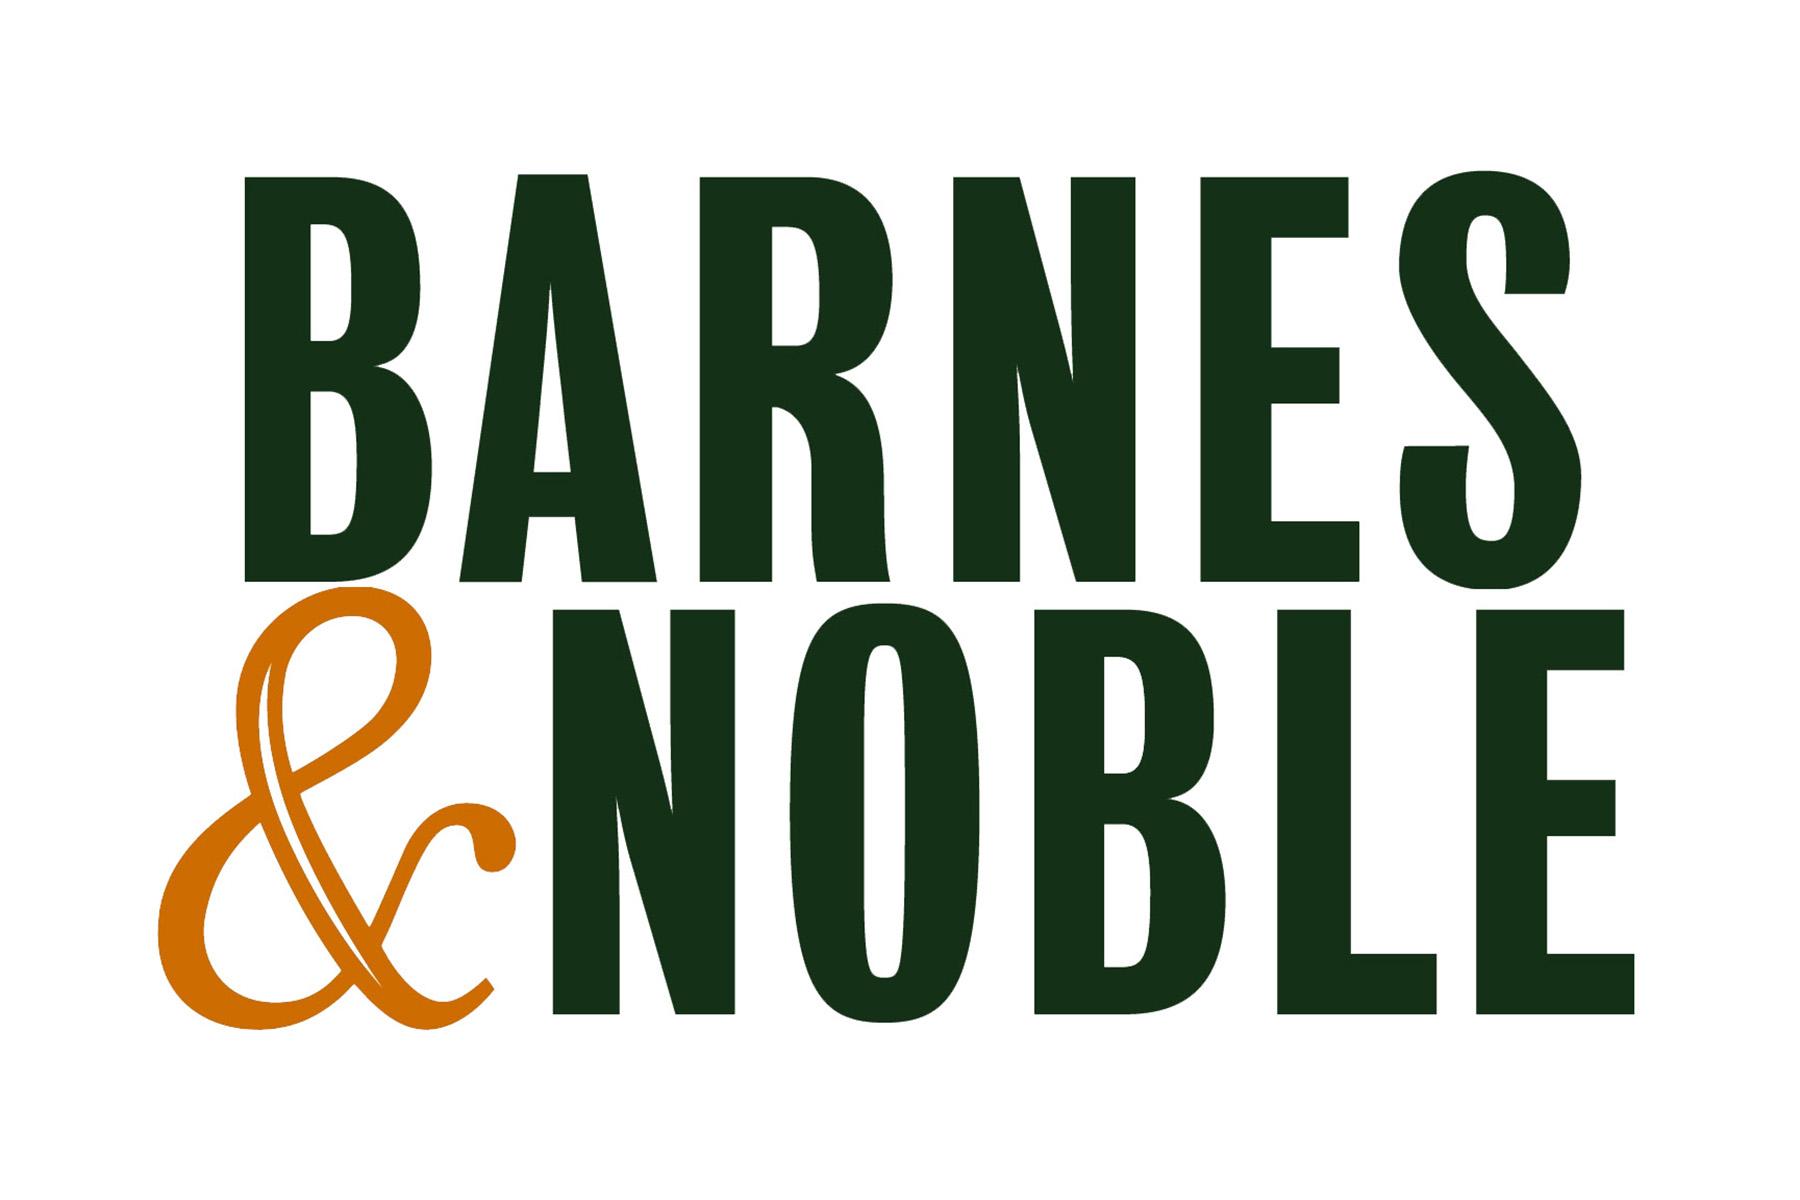 BARNES AND NOBLE LOGO.jpg